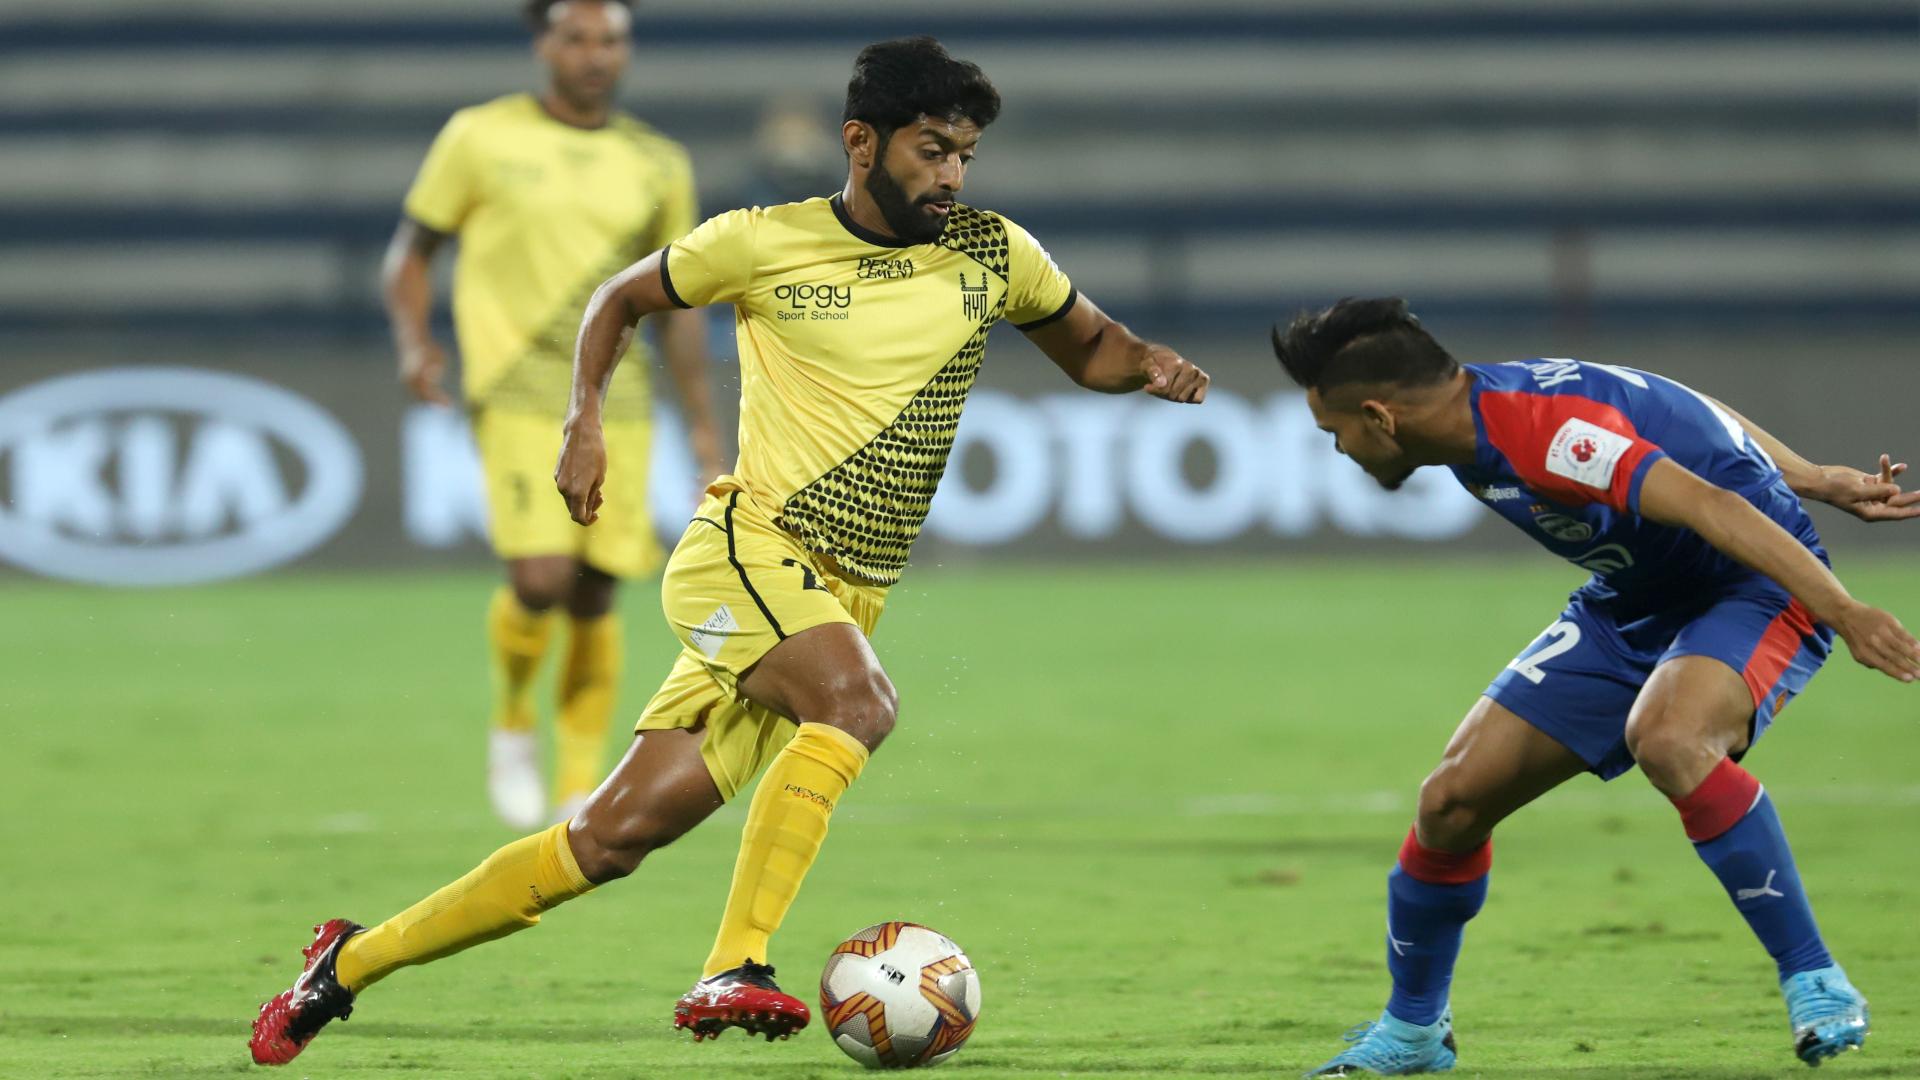 Nikhil Poojary v Bengaluru FC